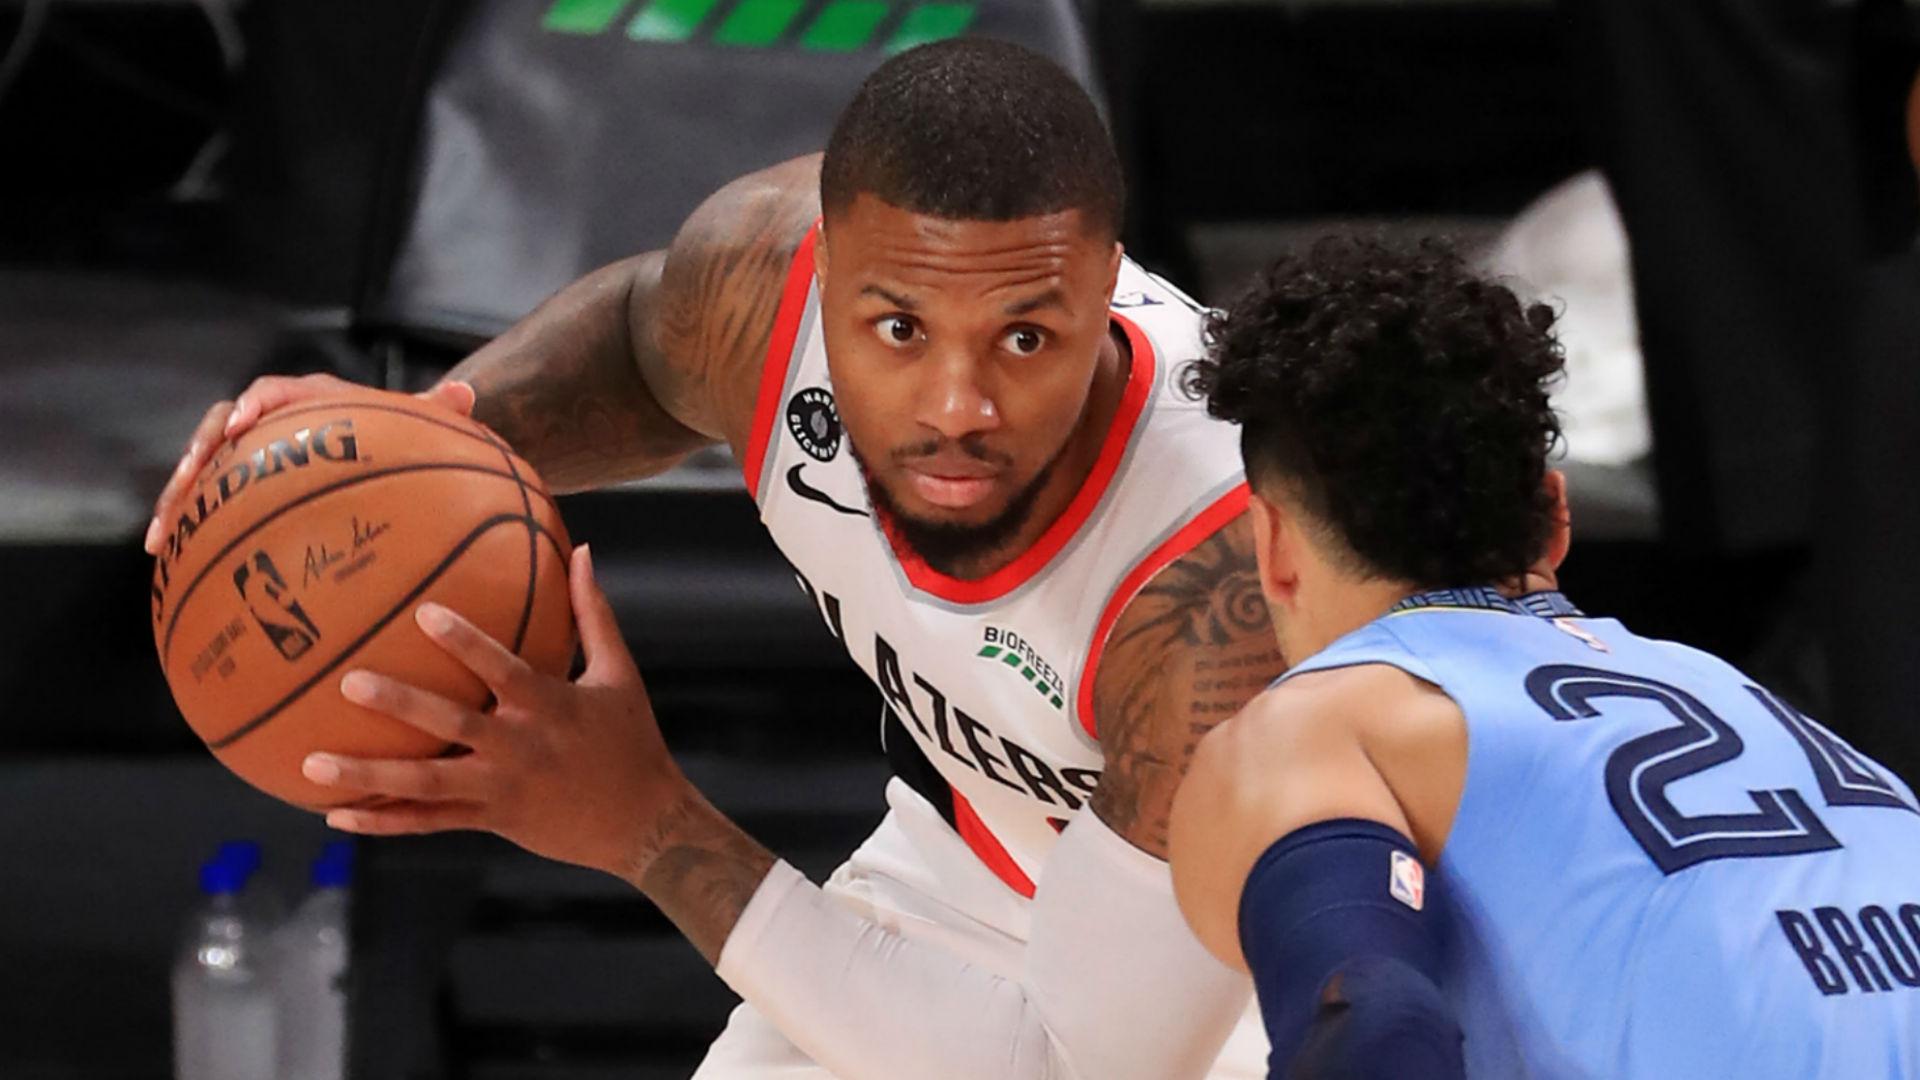 Damian Lillard trades rumors: Knicks ready to 'pounce' on Trail Blazers custody